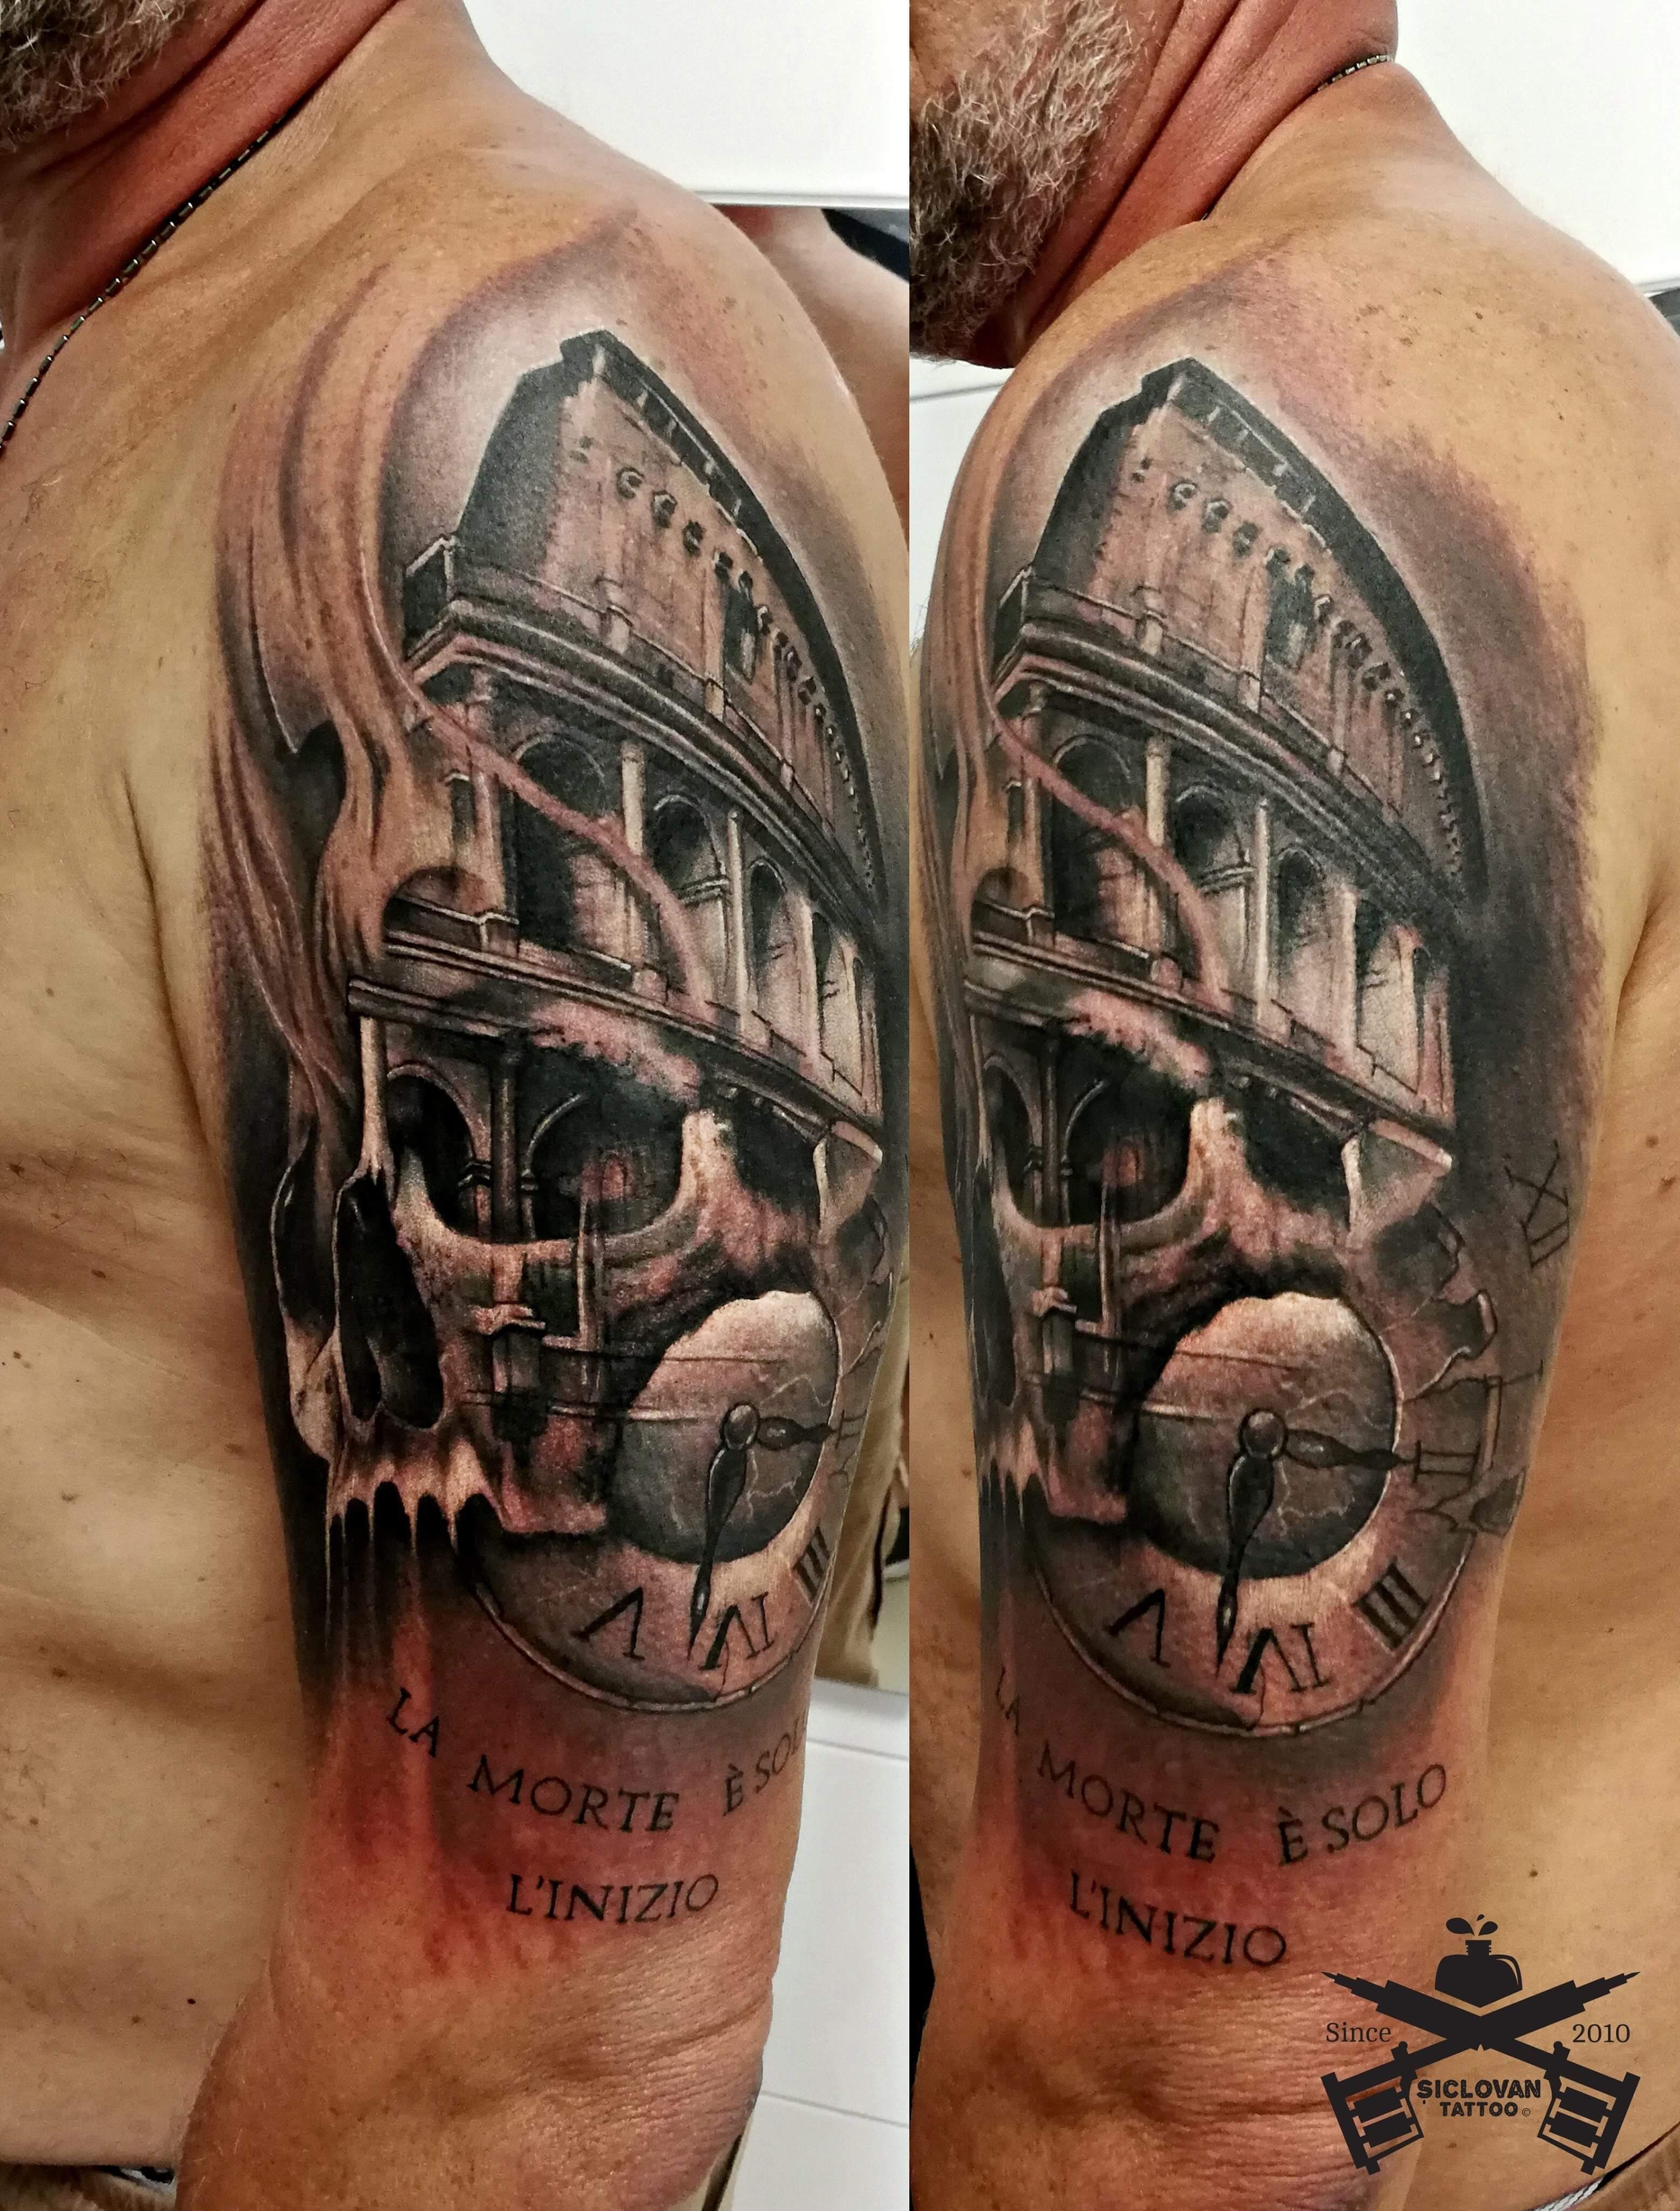 Coloseum Tattoo Italien Hautkultur Andreisiclovan Rom Mannheim Scull Tattoo Und Piercing Tattoo Studio Helix Piercing Stechen